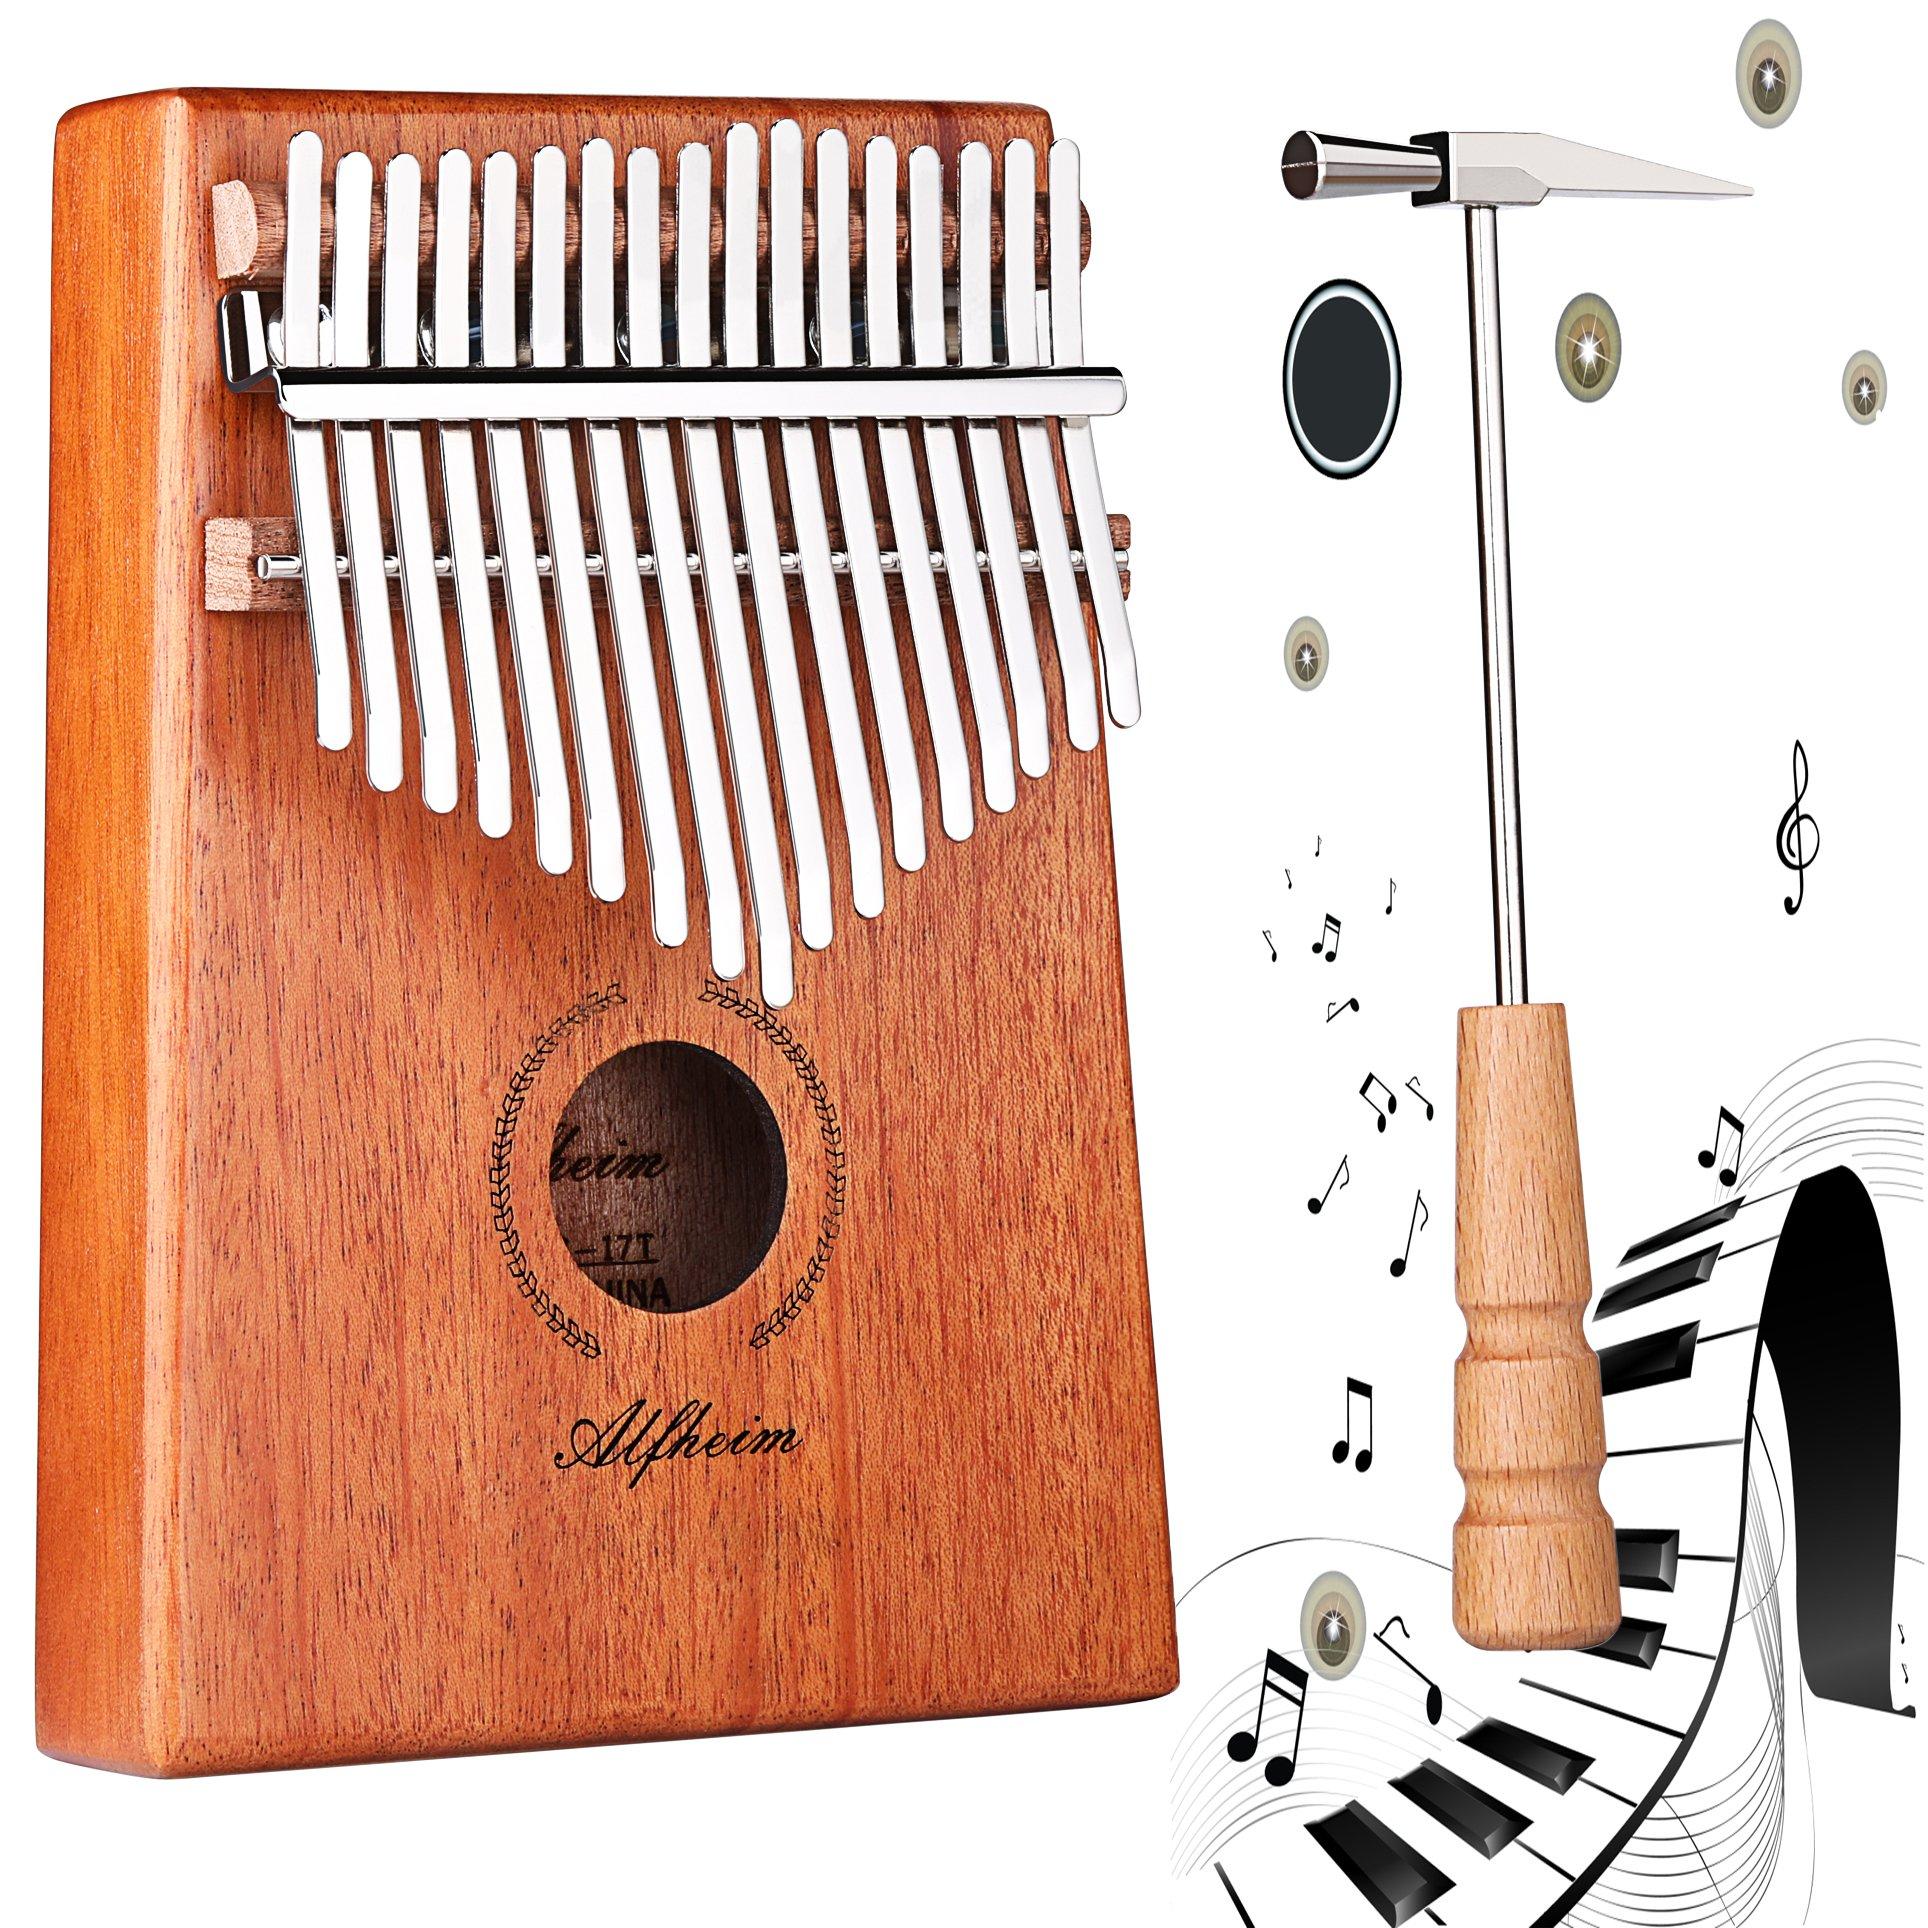 Thumb Piano, Alfheim 17 Keys Kalimba Thumb Piano Mbira,Fingers Piano African Instrument